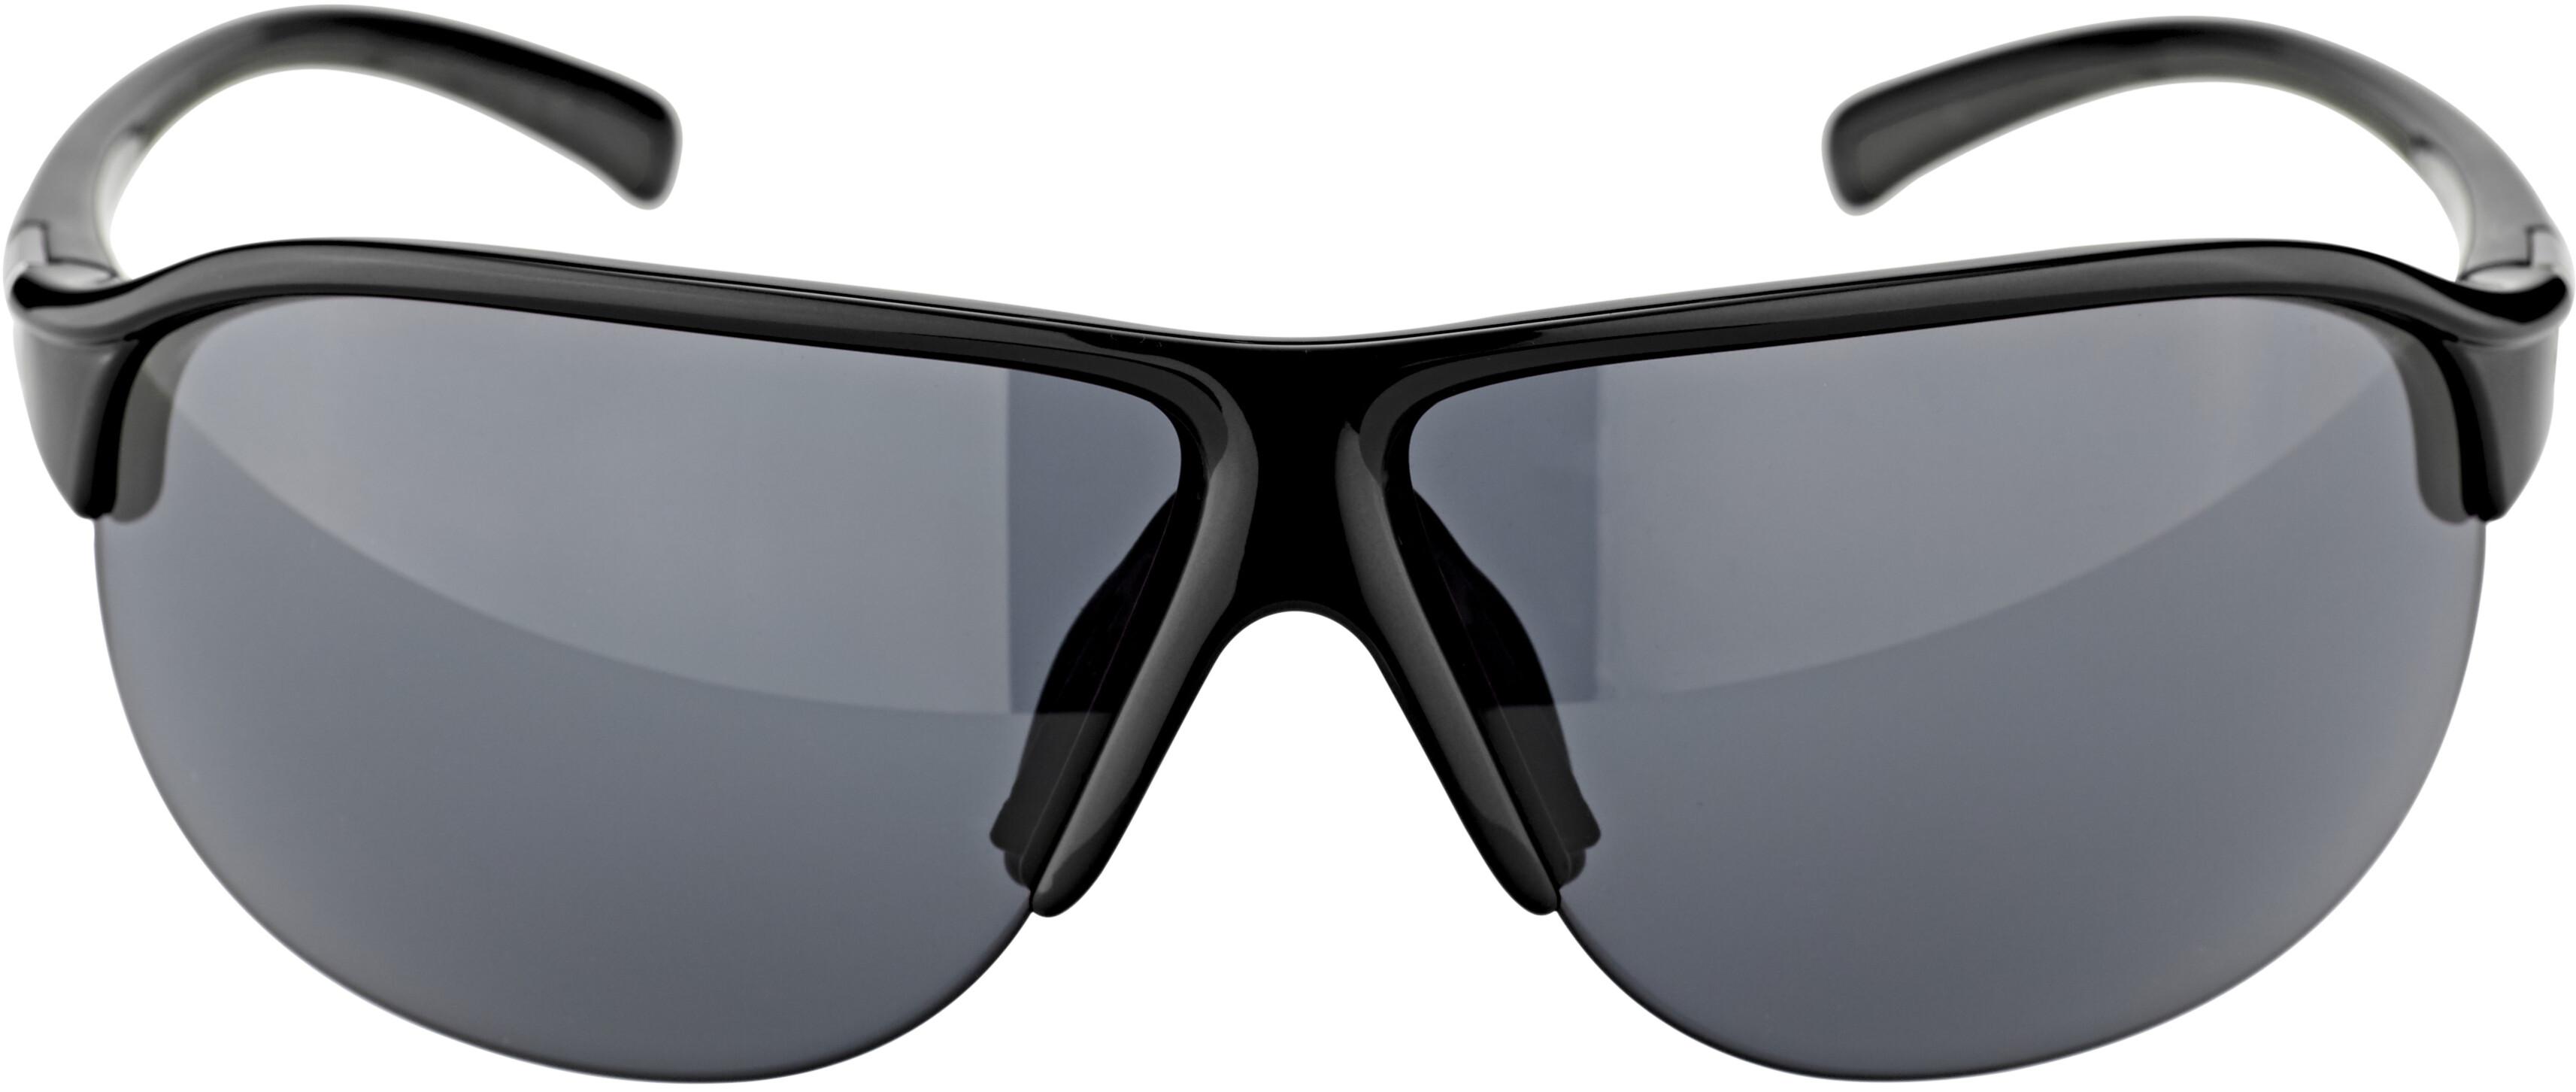 4c3b5109f93d adidas Pro Tour Cykelbriller S sort